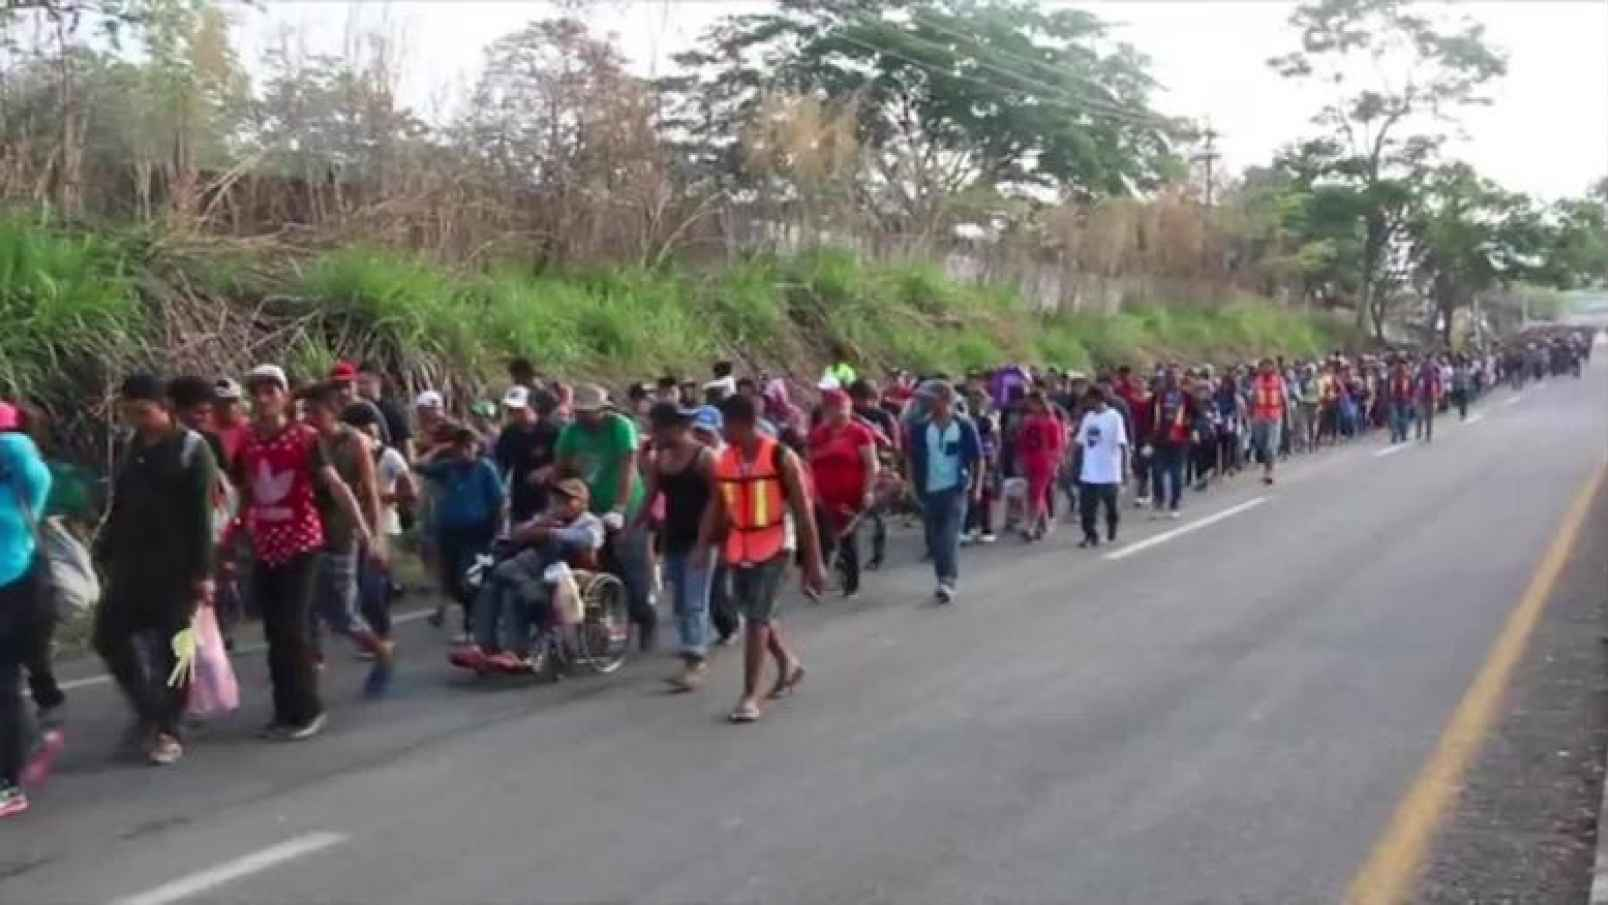 'Migrant' convoys, criminal sanctuaries and American churches